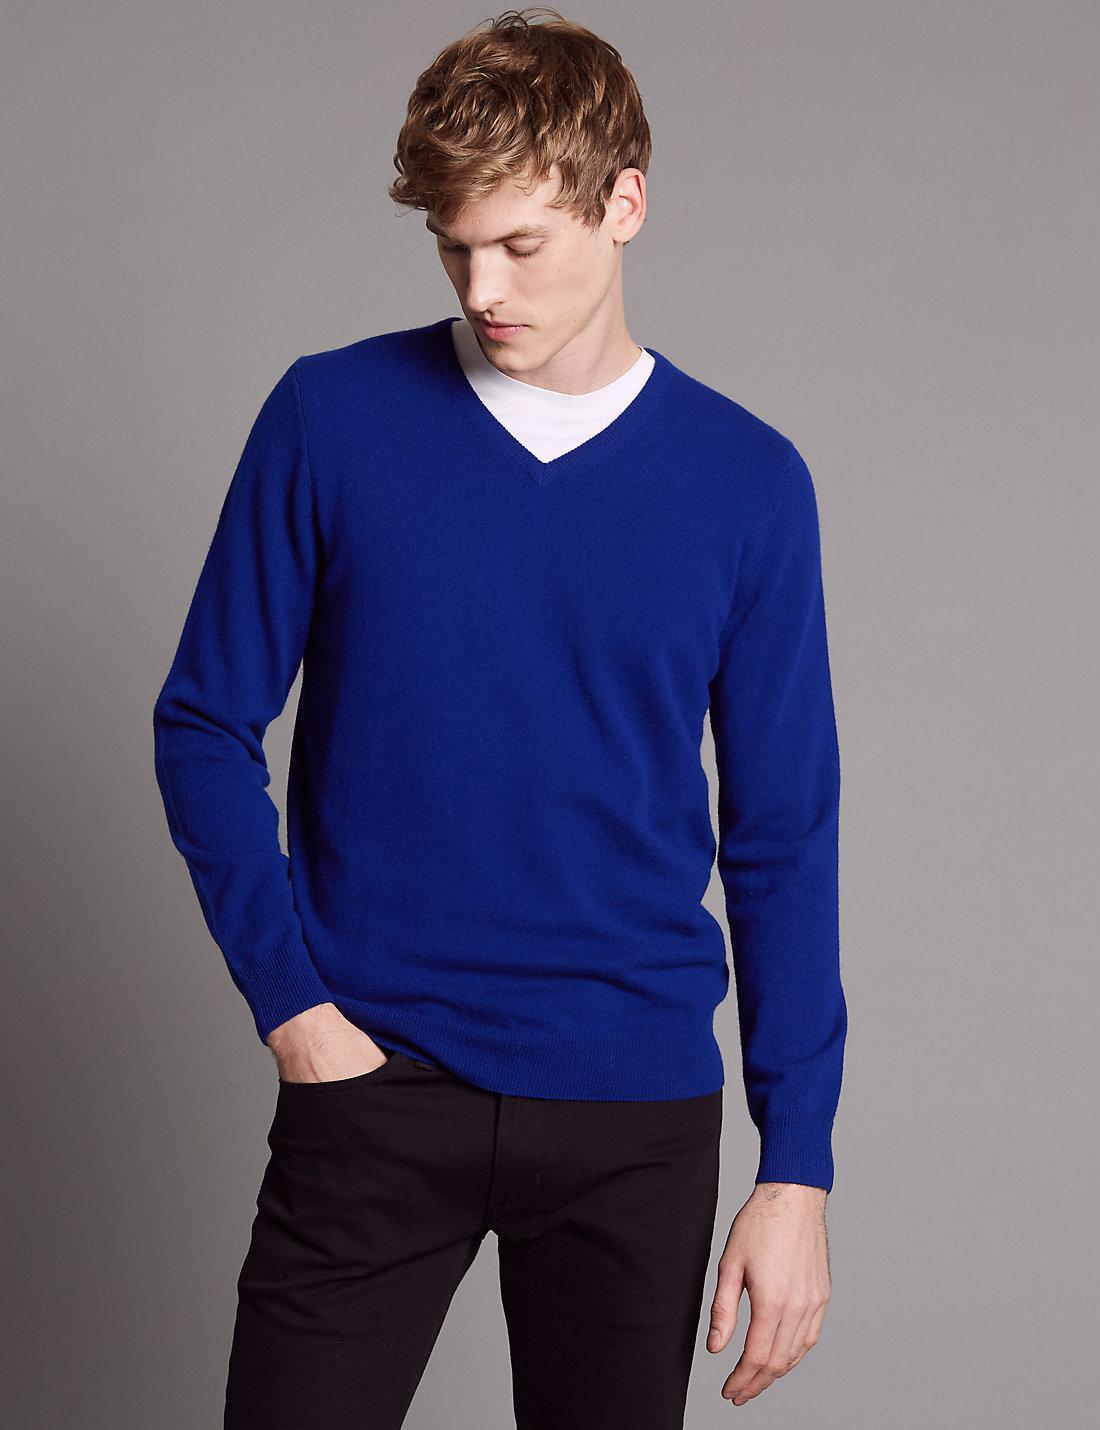 Lyst - Marks   Spencer Pure Cashmere V-neck Jumper in Blue for Men 792e9937b